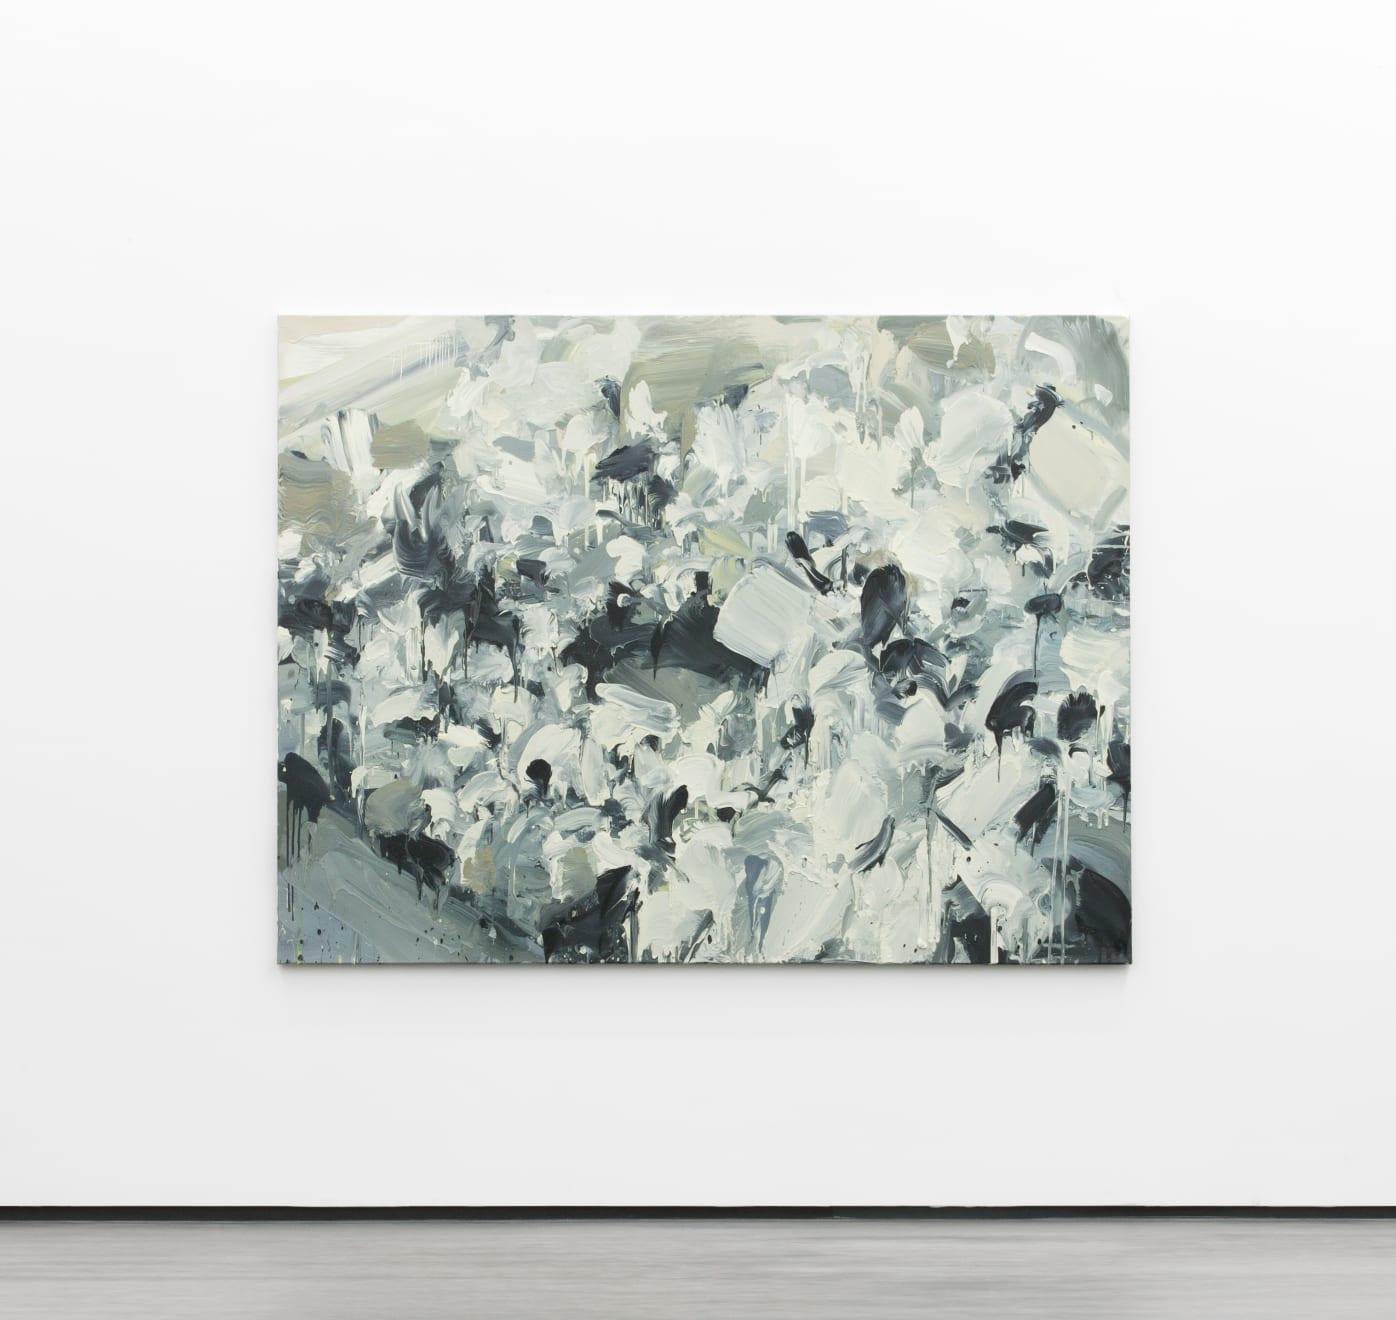 Laura Lancaster, Untitled, 2013